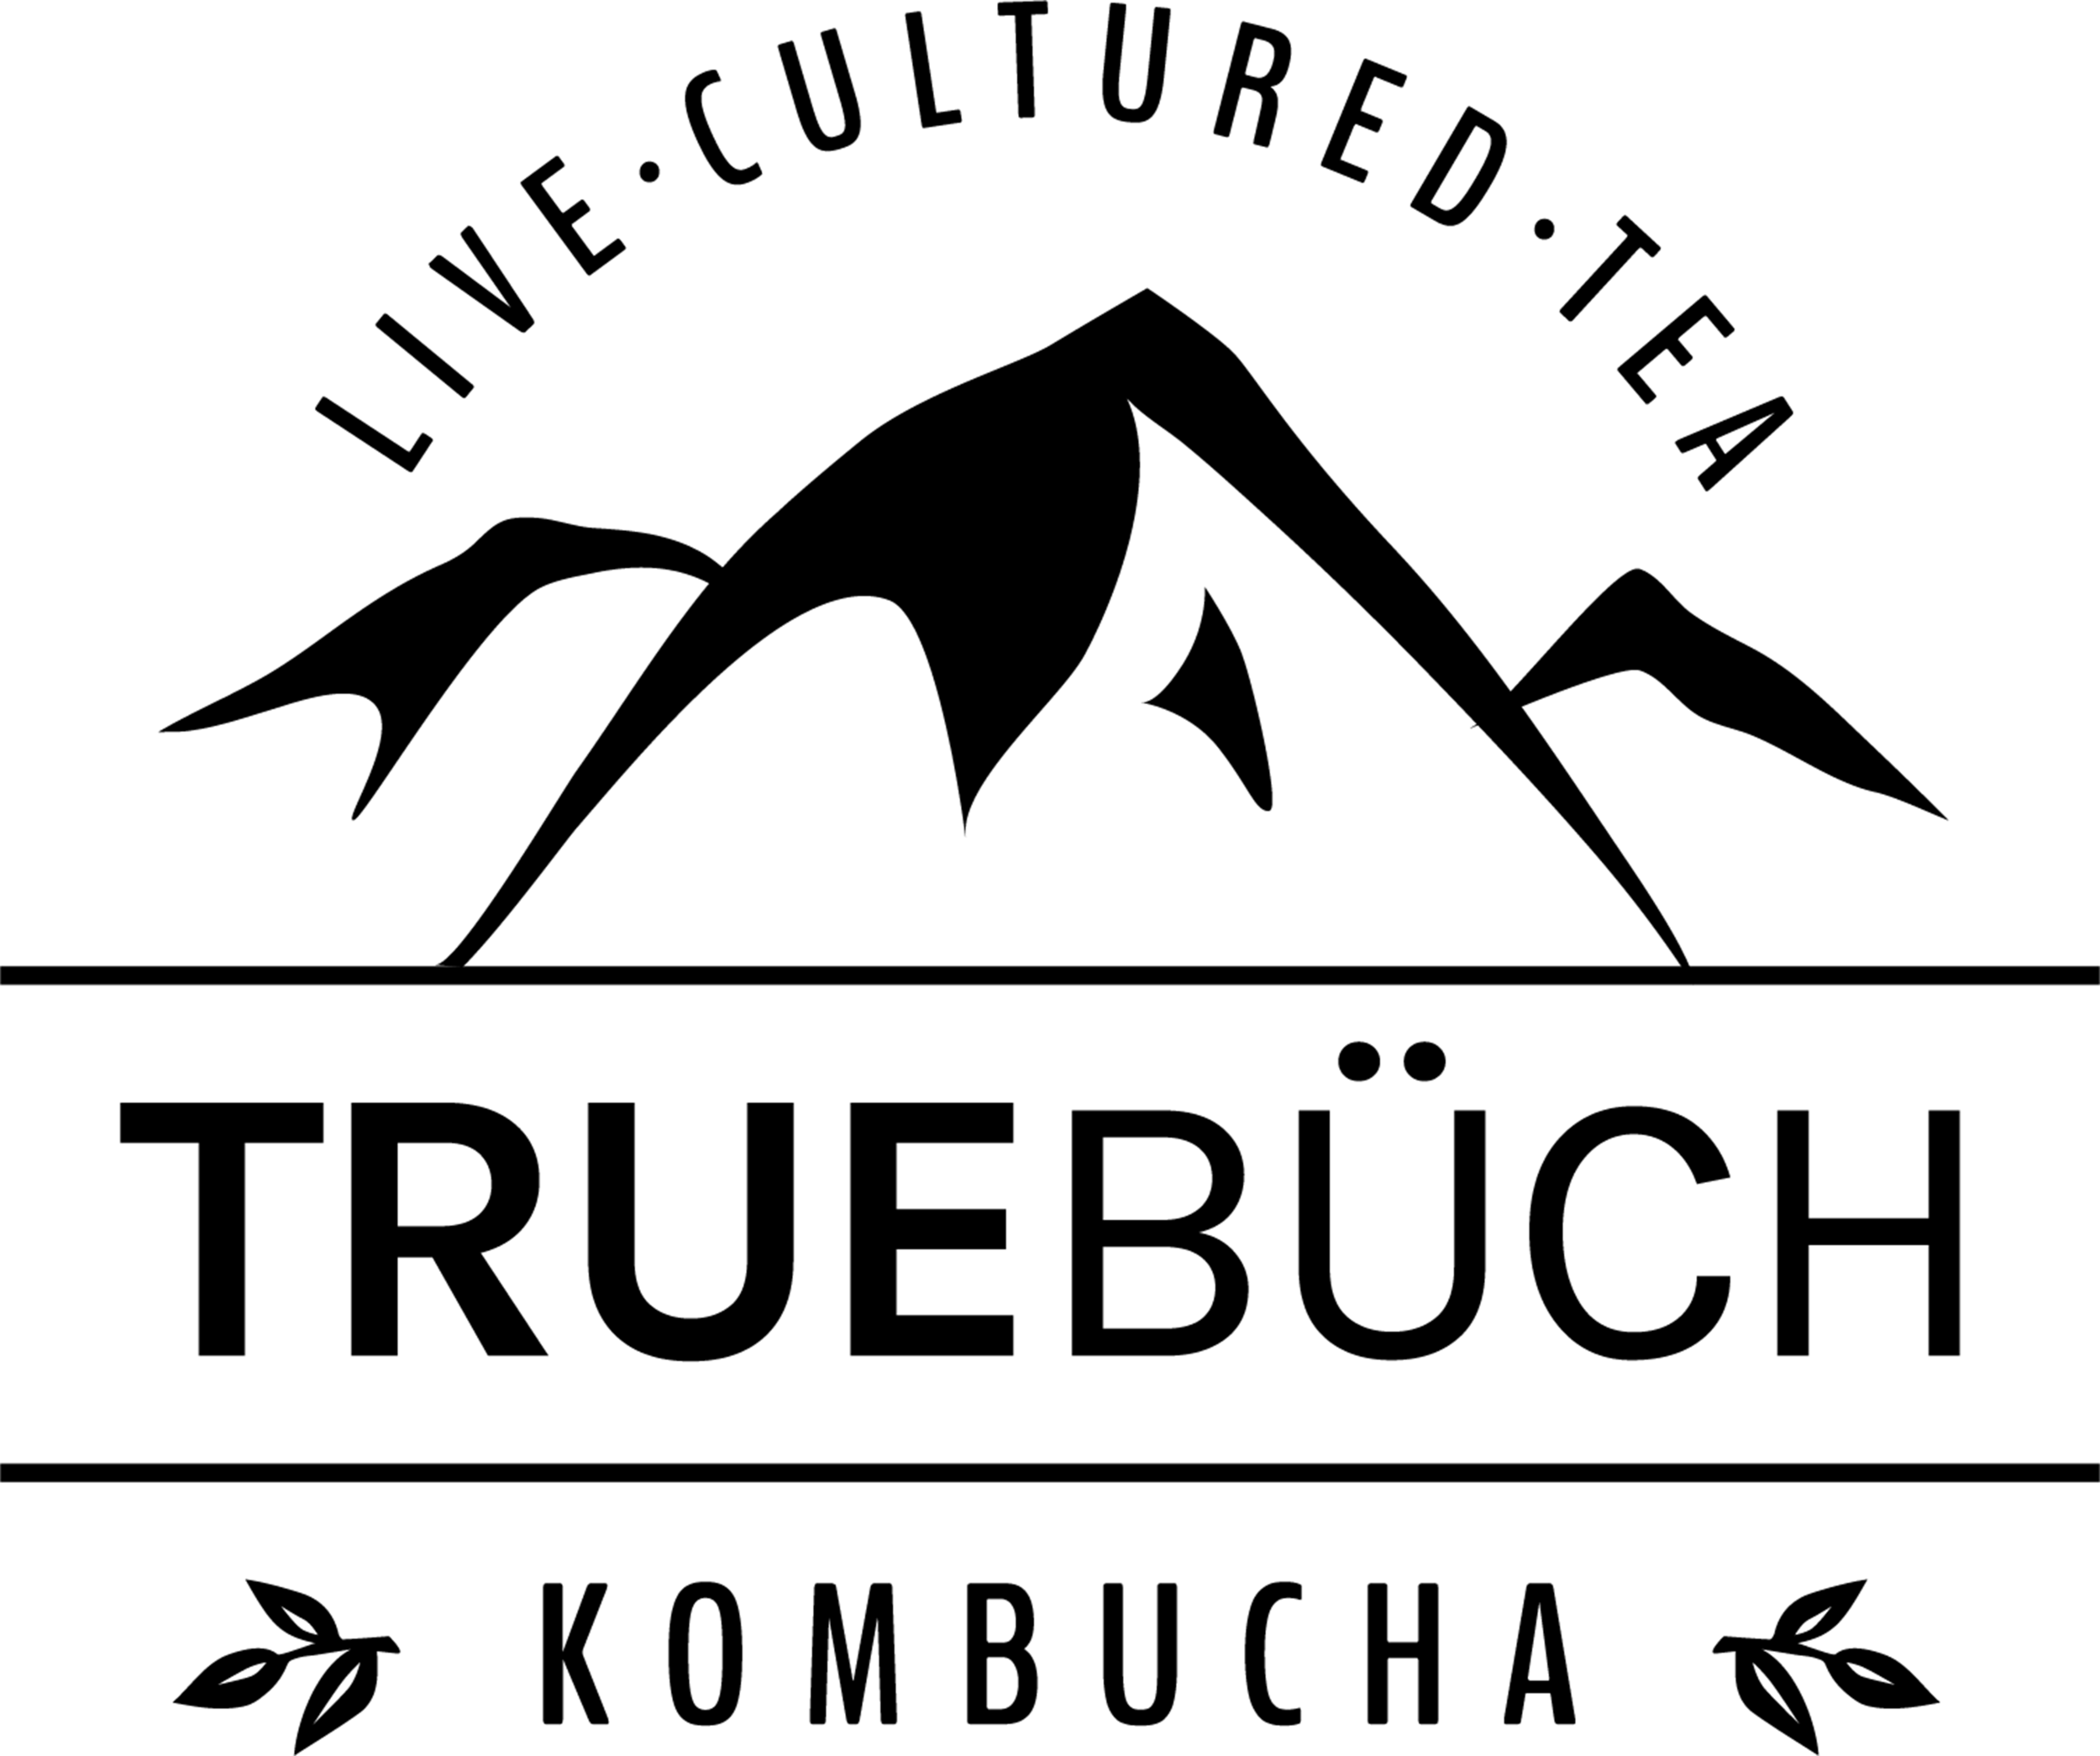 TrueBuch_3 - Black.png